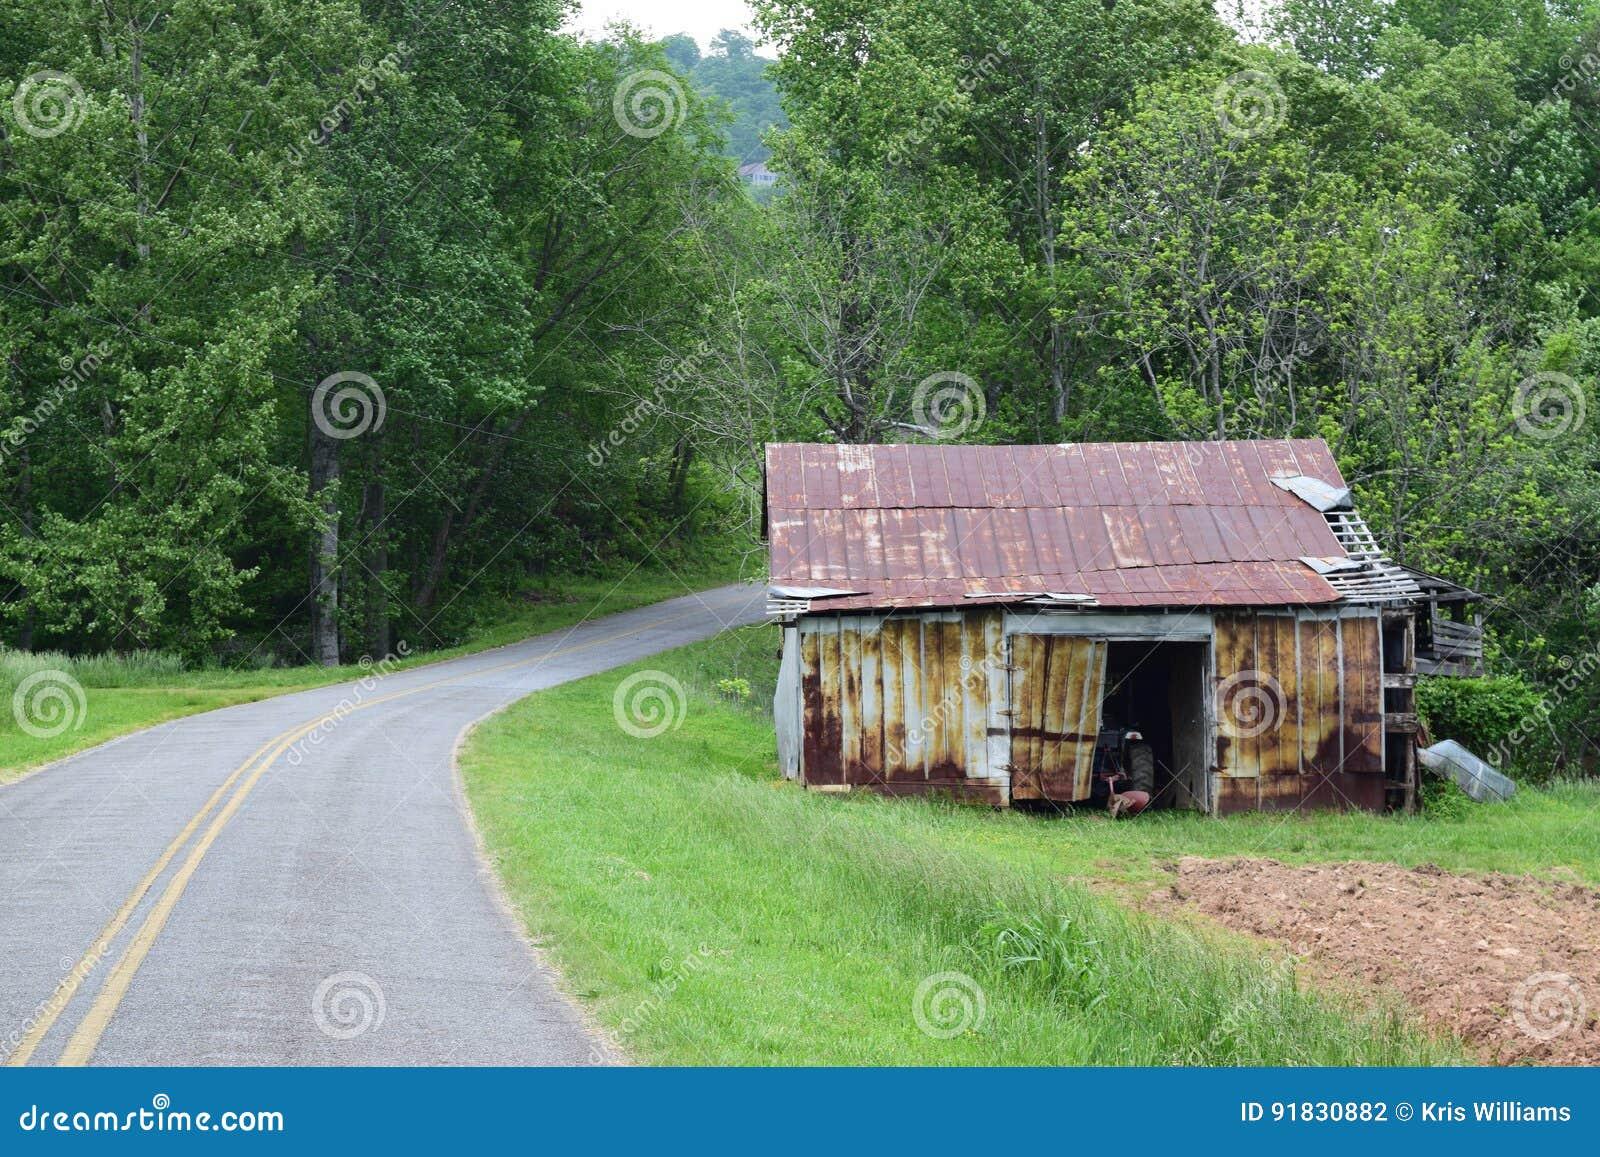 Western NC mountain rural fam road